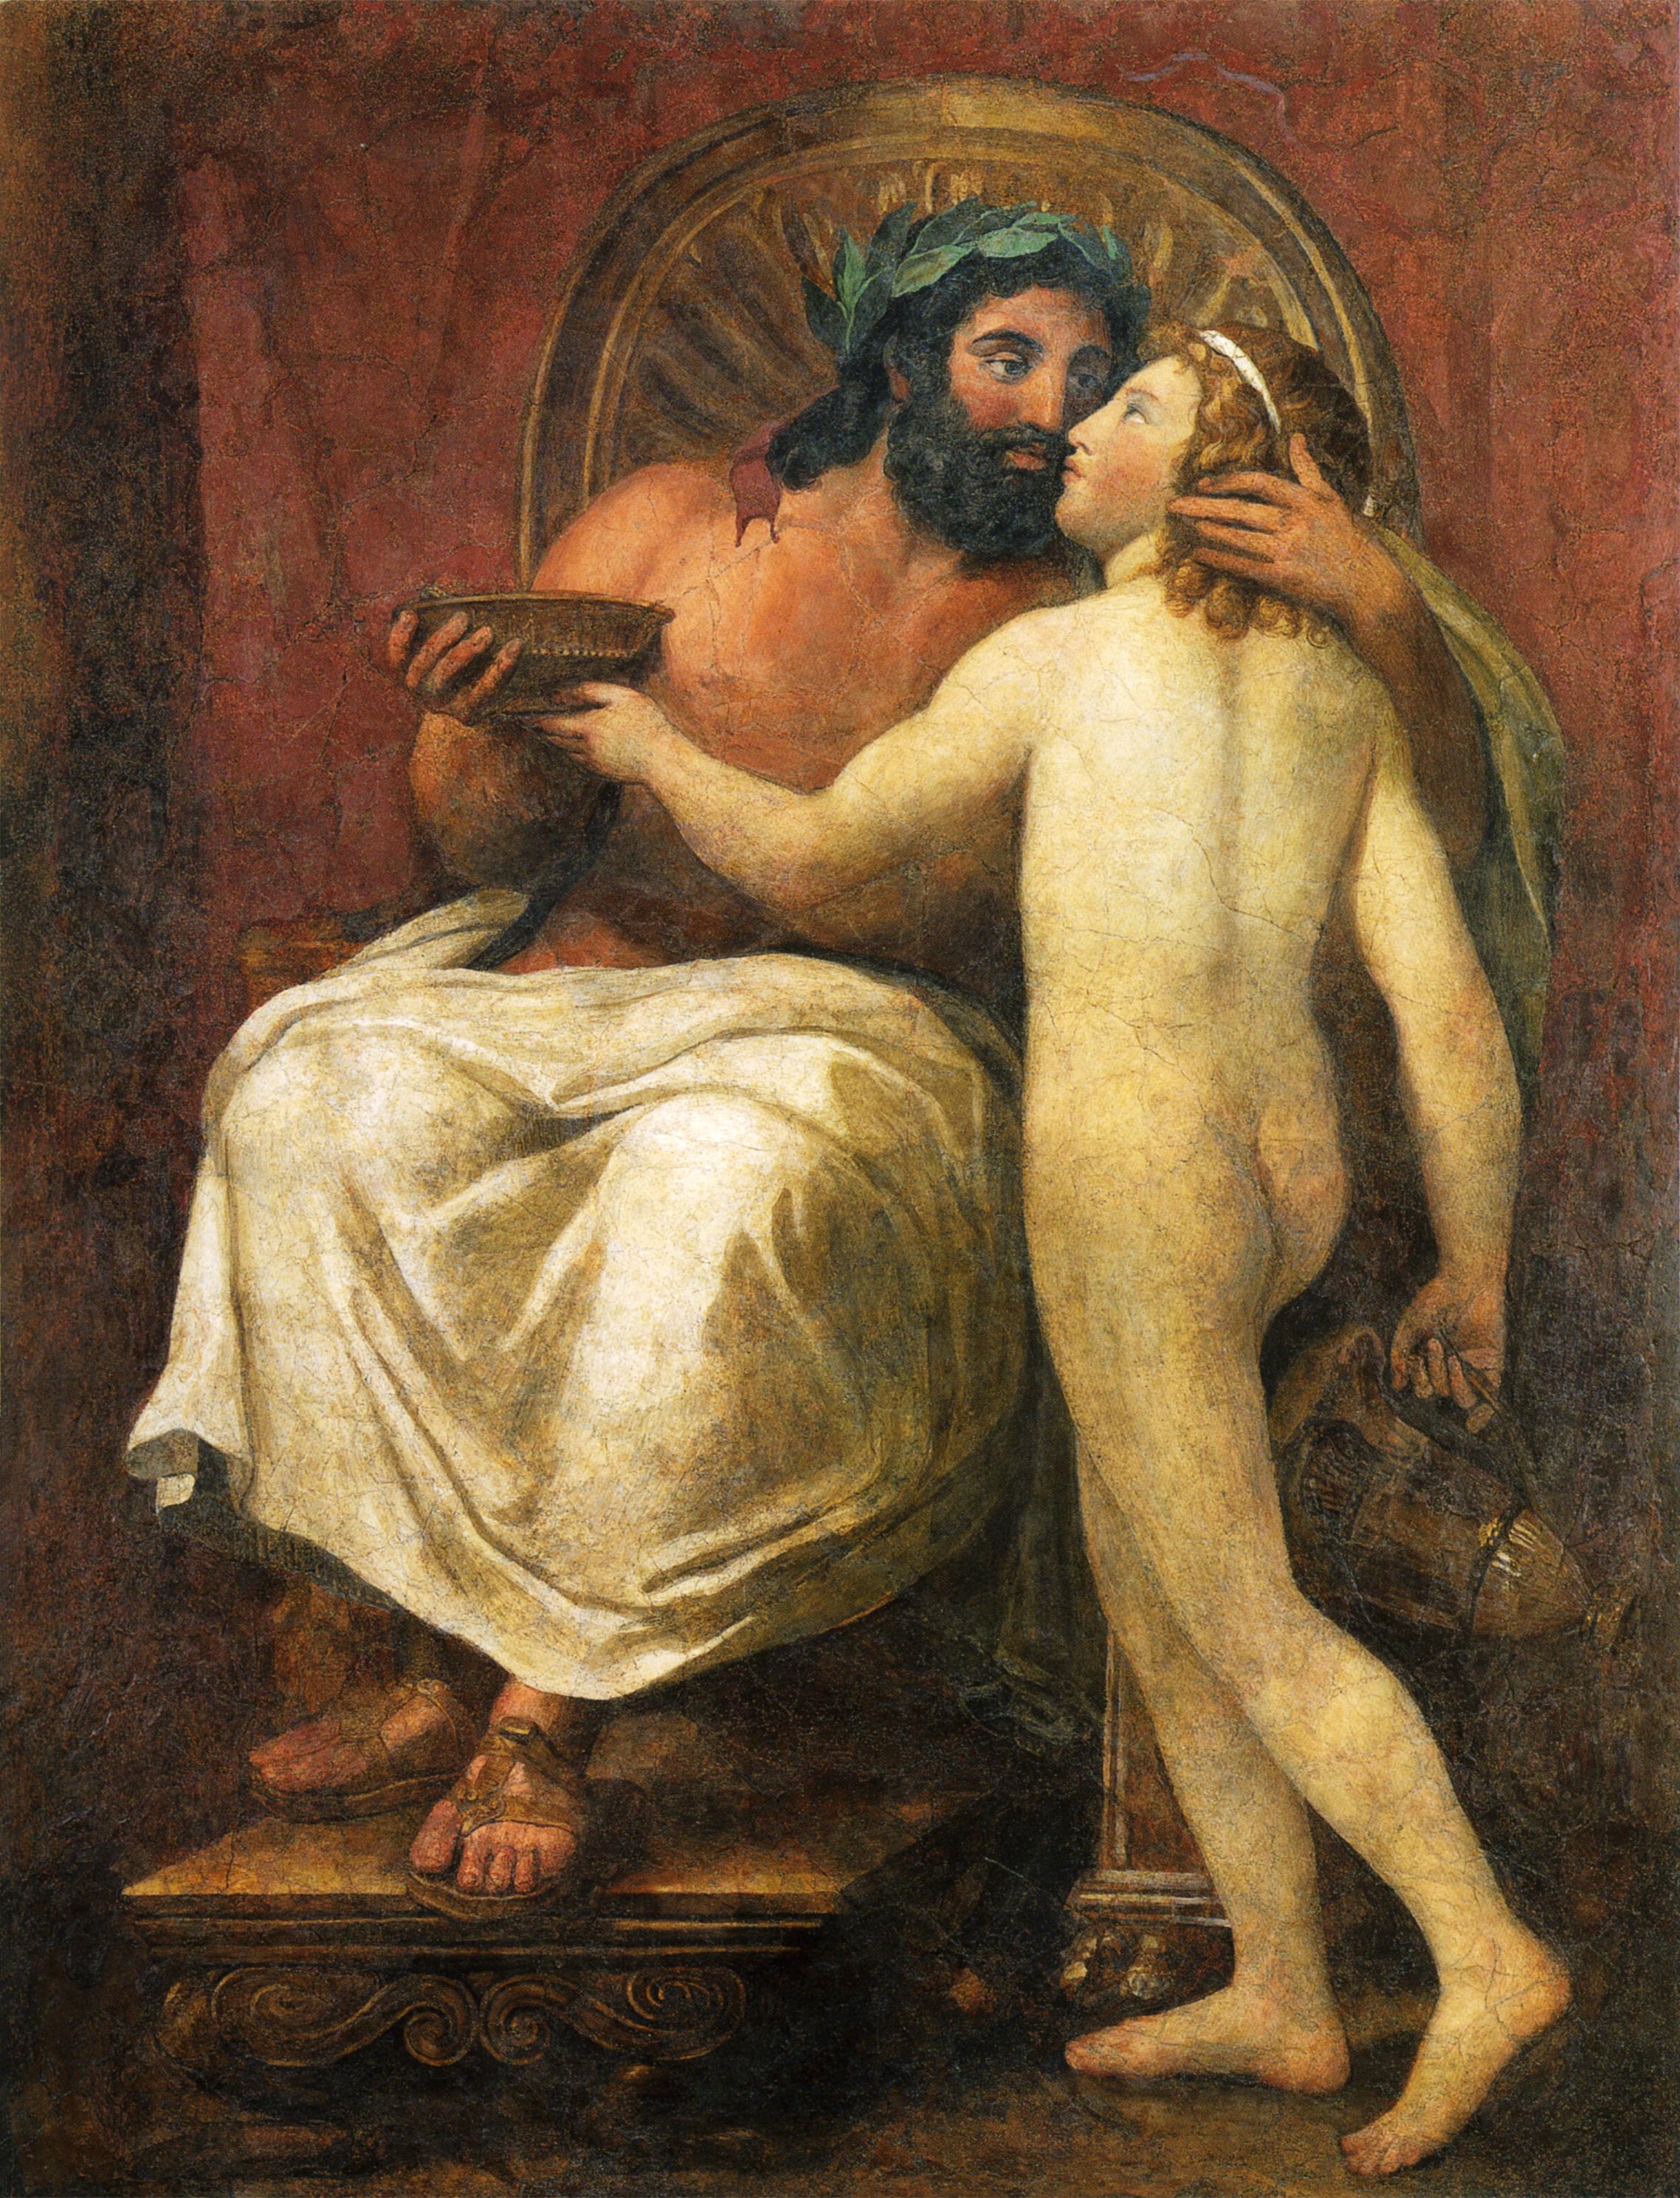 Figura 12 - Anton Raphael Mengs, Júpiter acaricia Ganimedes